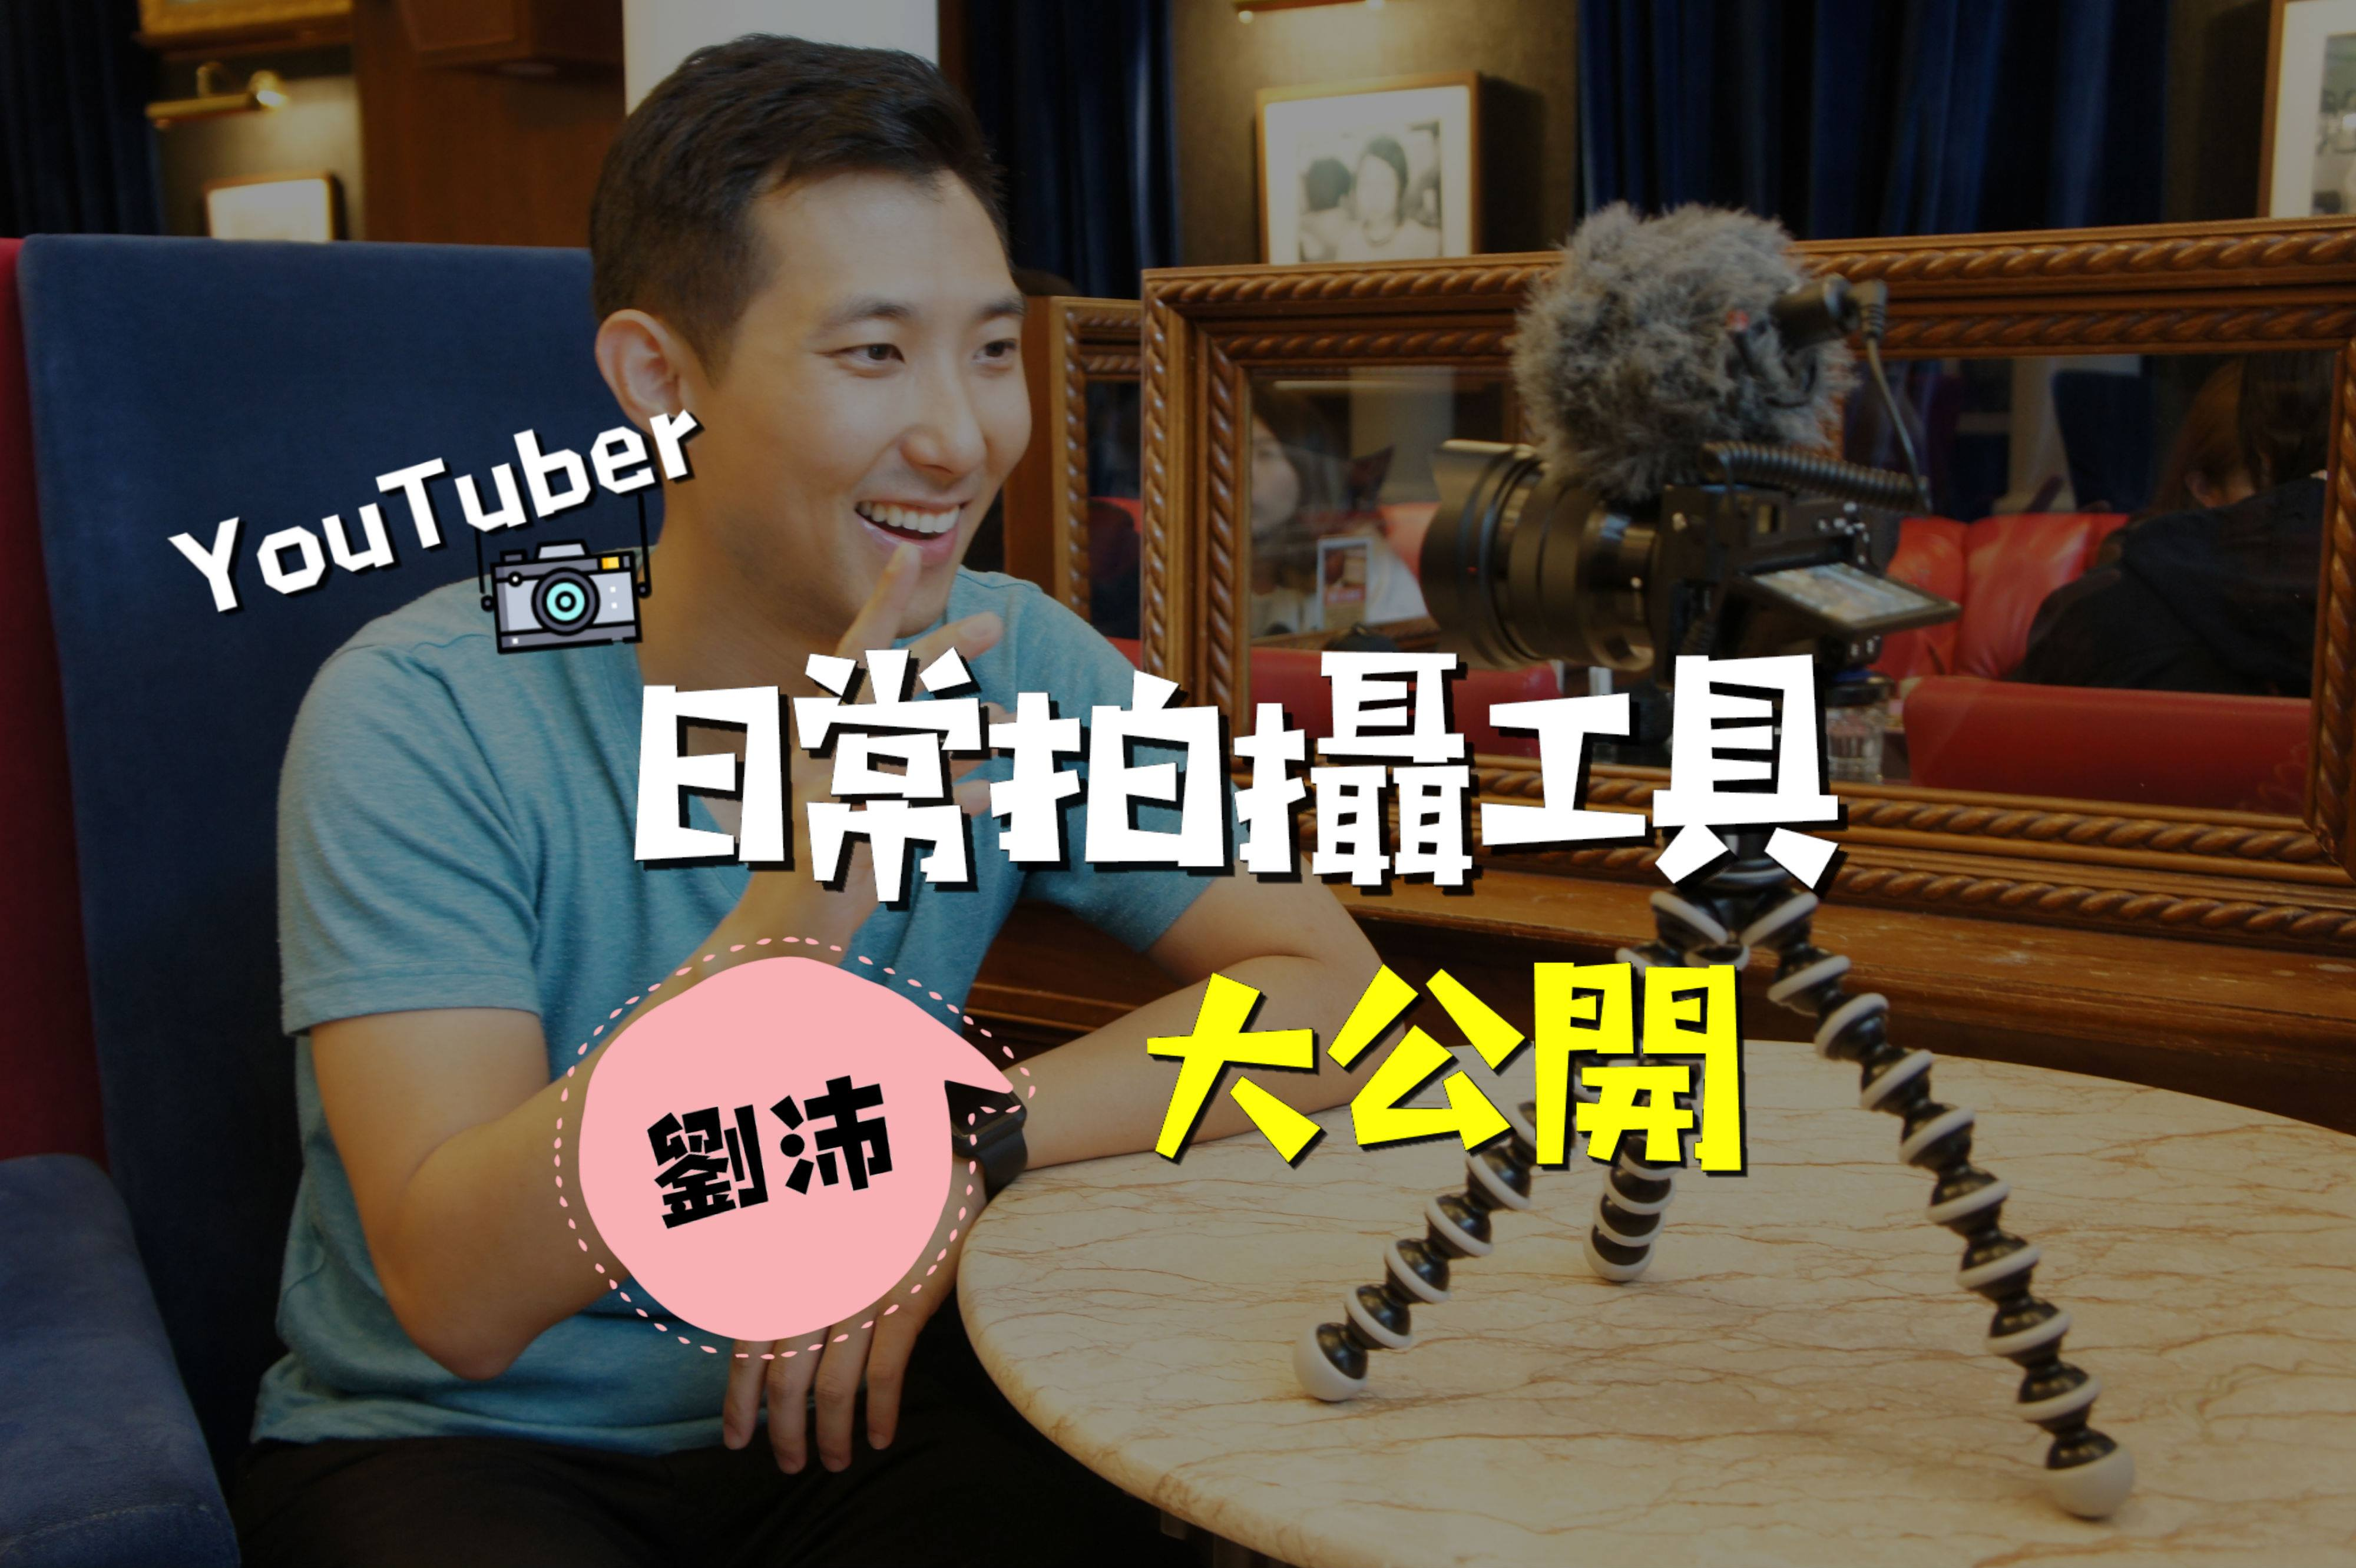 【YouTuber拍攝工具大公開x劉沛】Vlog、戶外活動怎麼拍?不用大包小包也能拍出專業影片